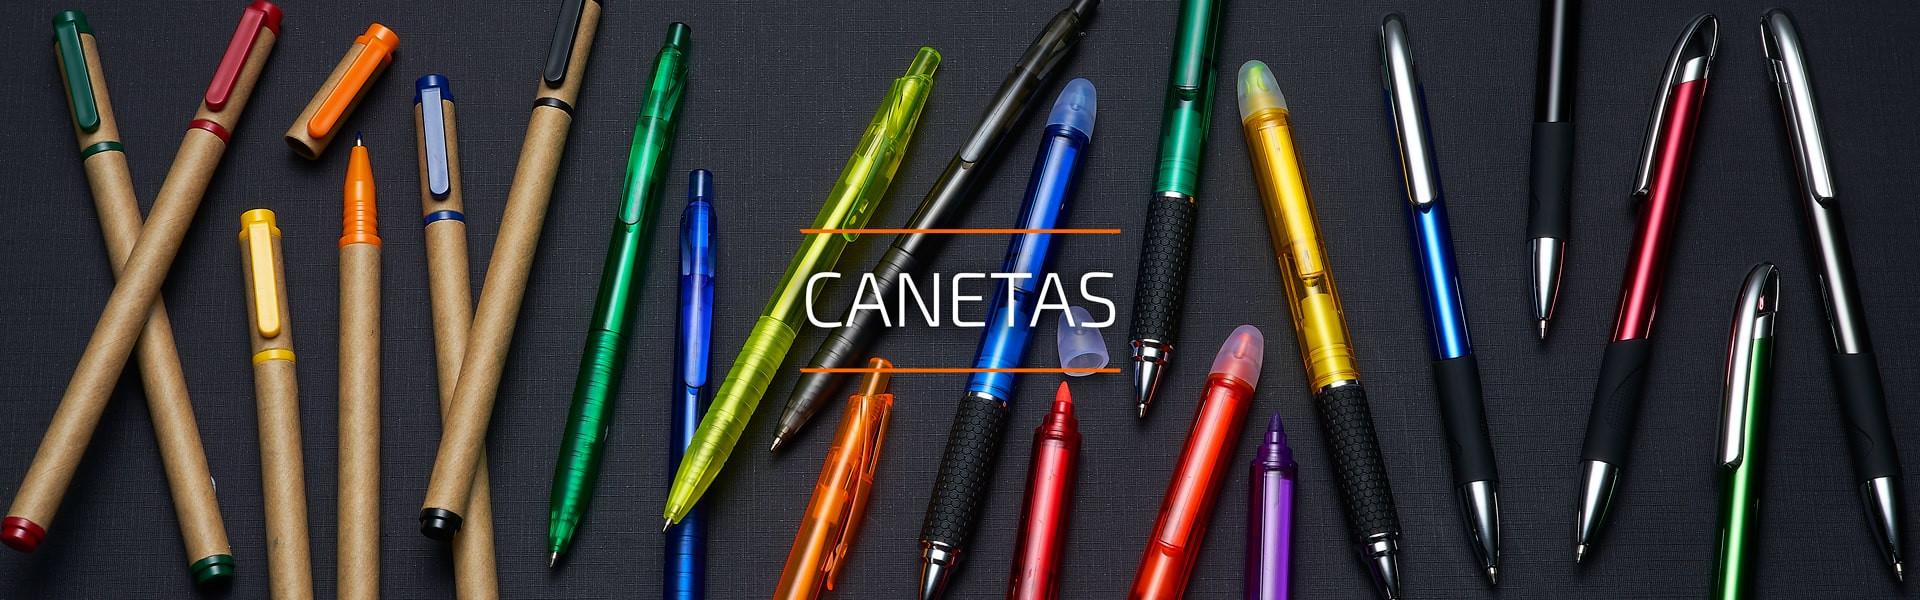 banner_CANETAS-min.jpg